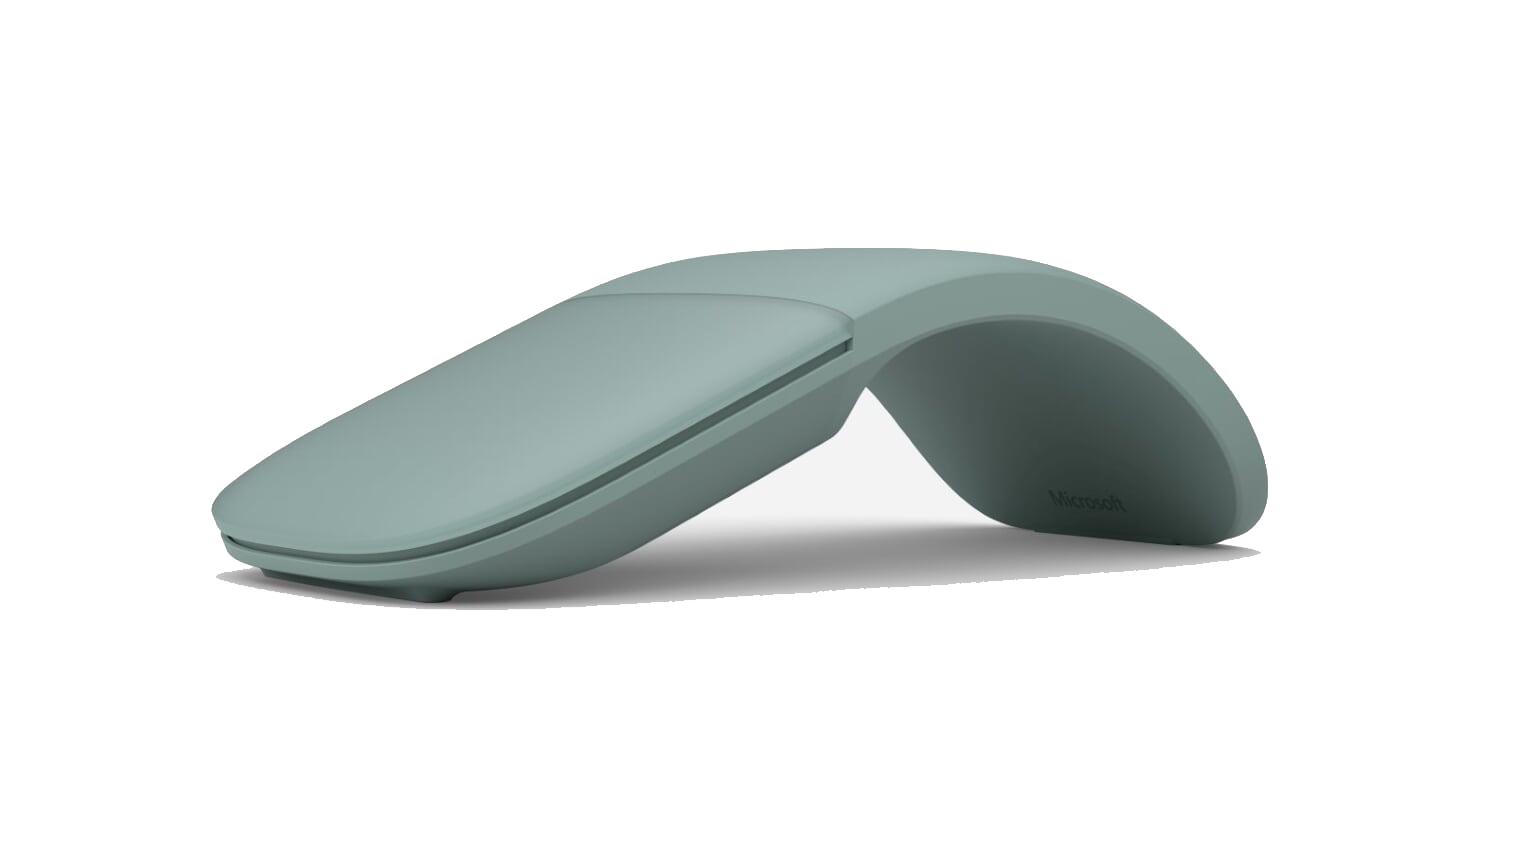 Microsoft Arc Mouse Bluetooth 4.0, Sage - ELG-00047